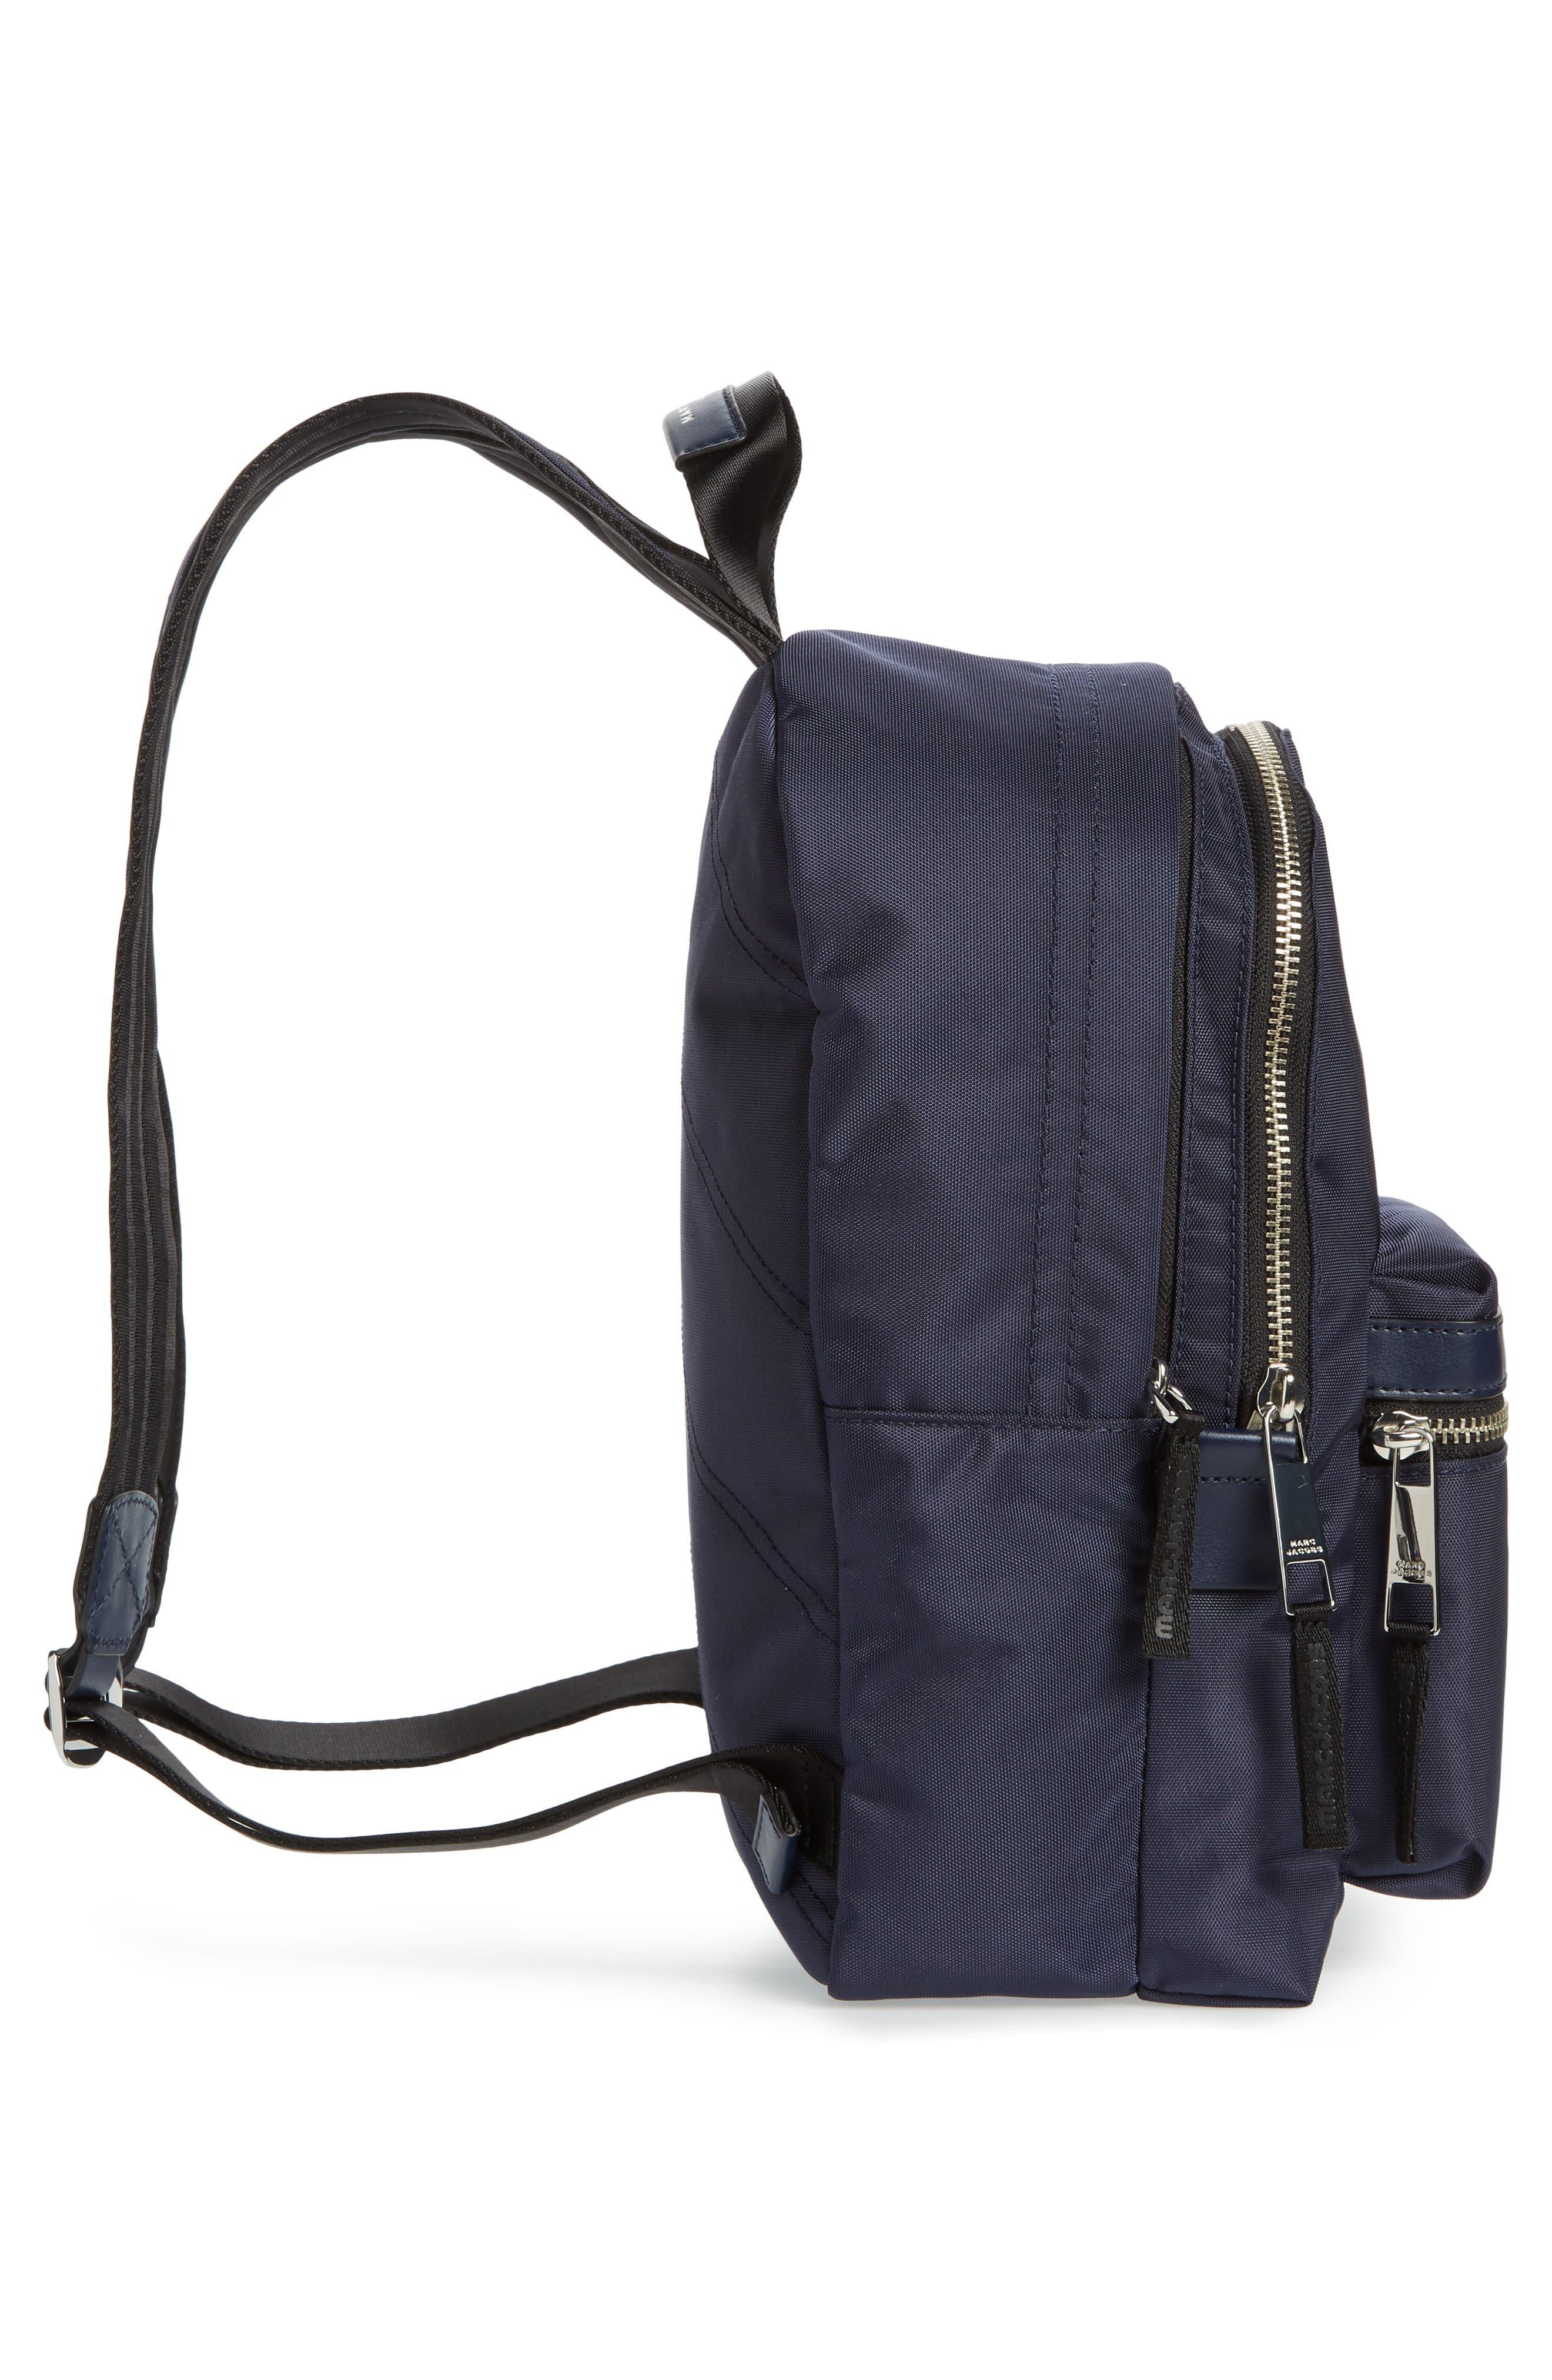 Medium Trek Nylon Backpack,                             Alternate thumbnail 5, color,                             MIDNIGHT BLUE